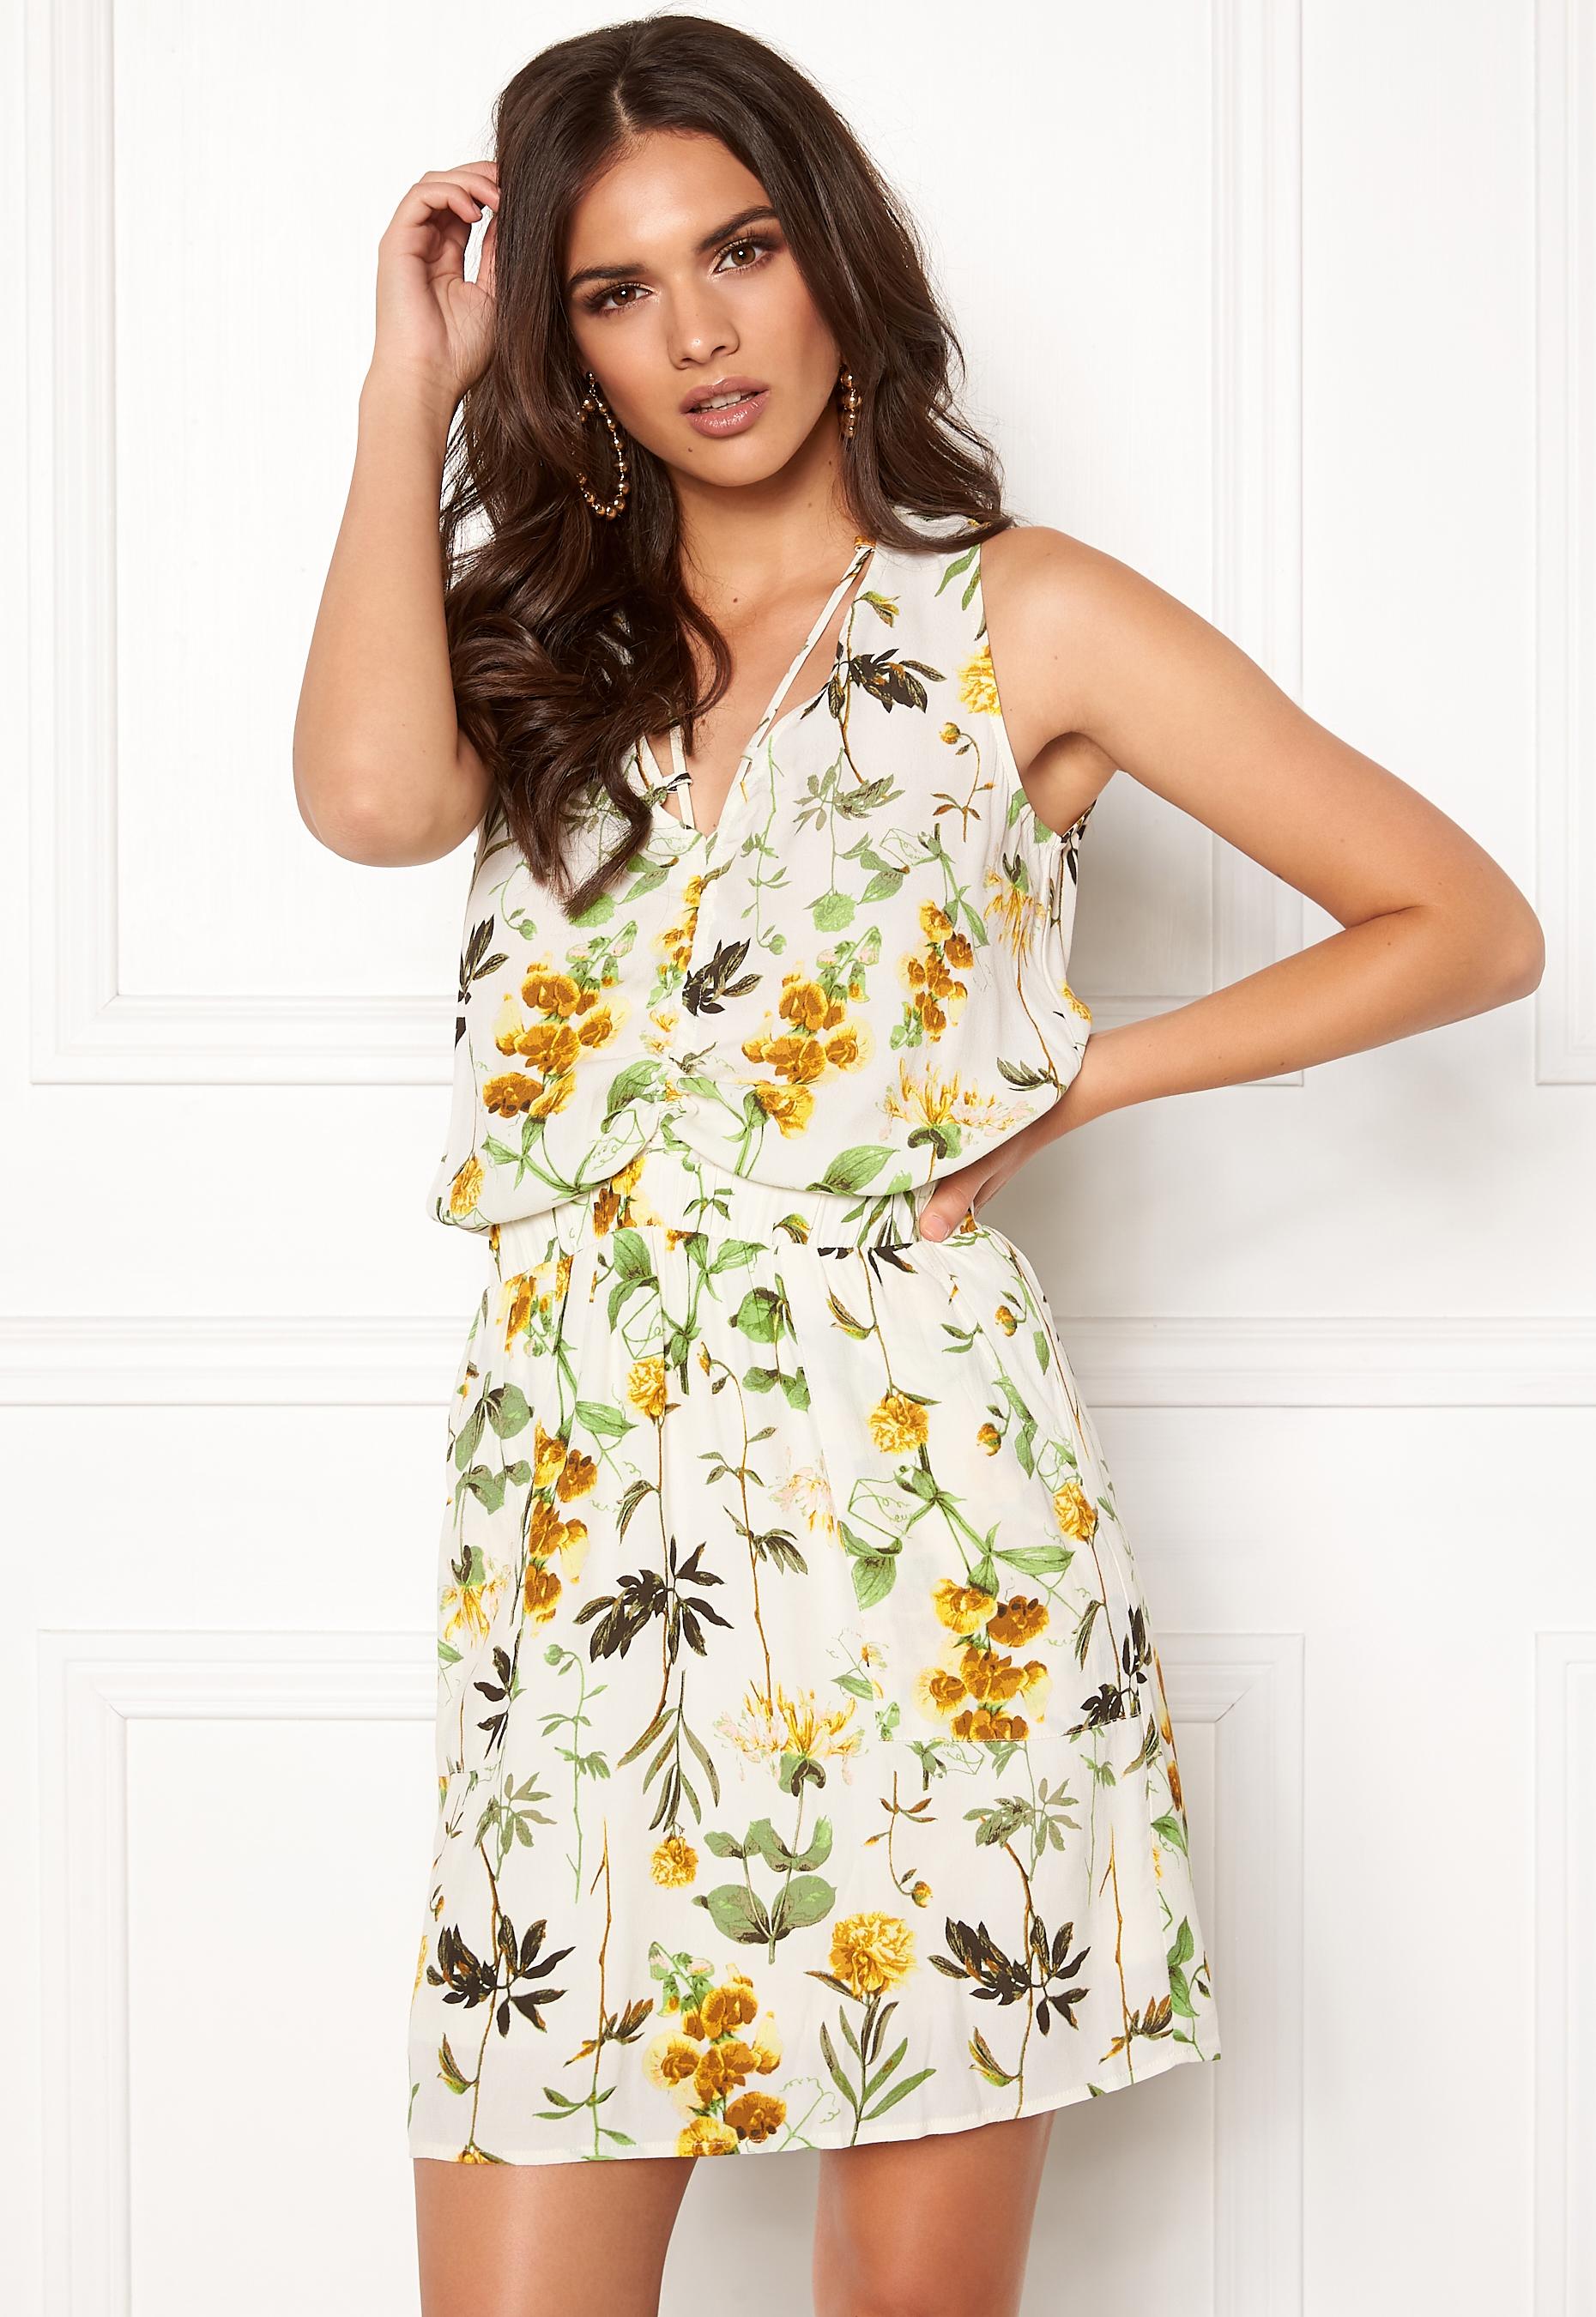 OBJECT Floressa S L Dress Gardenia - Bubbleroom d944bbe95d025